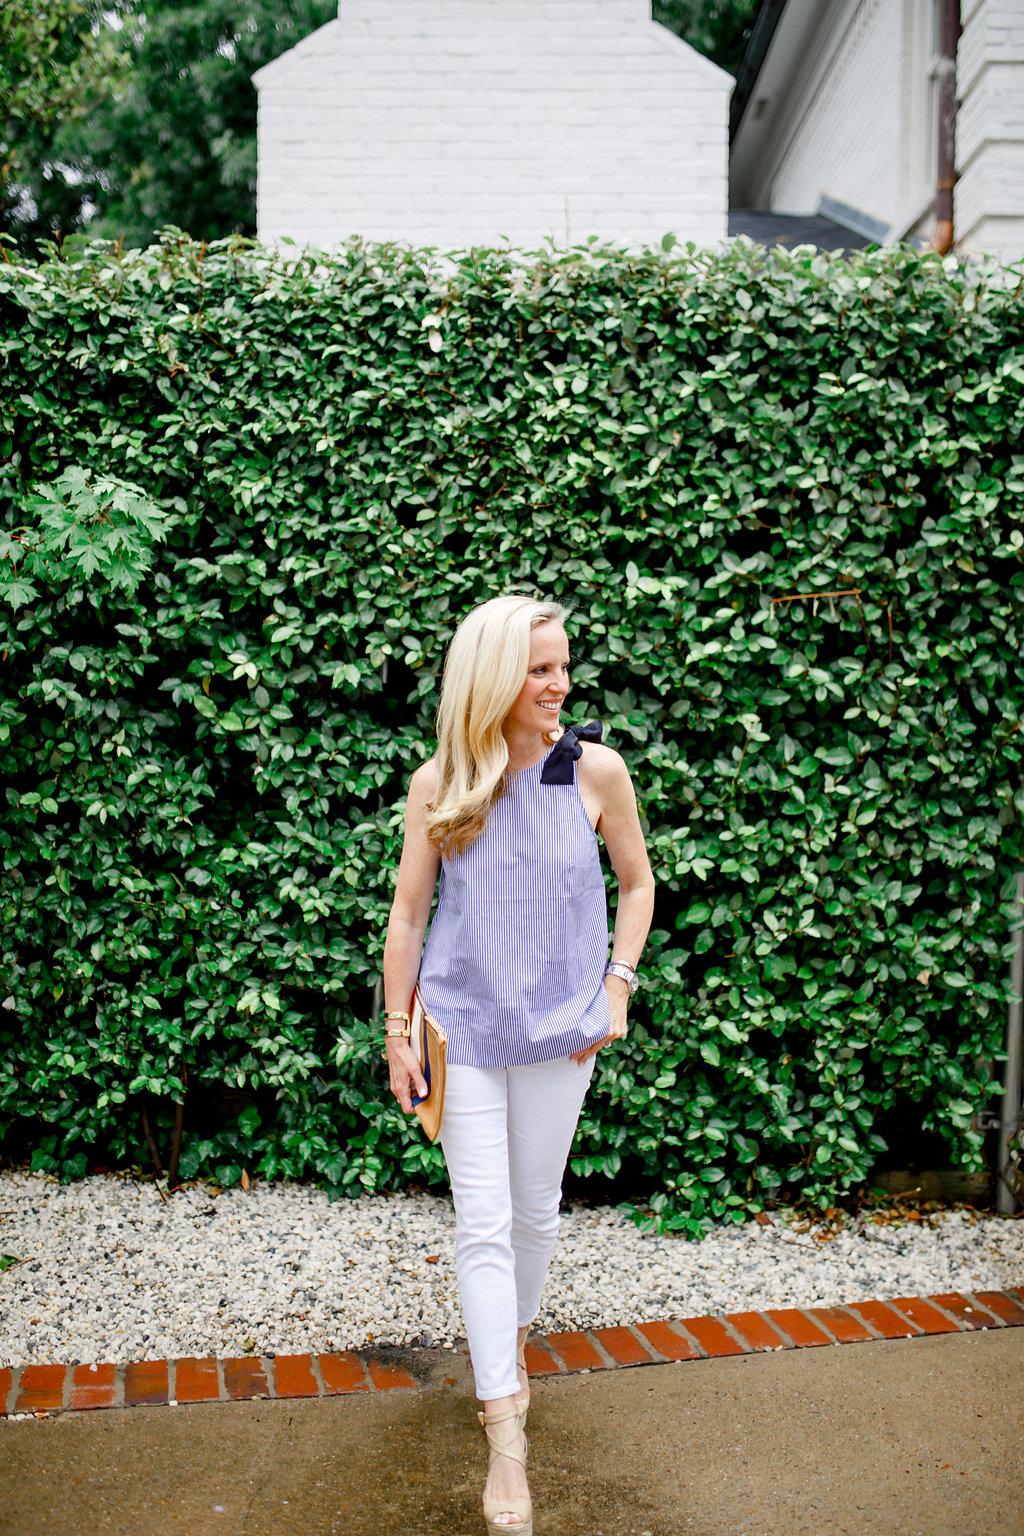 Best White Jean, Alicia Wood, Dallas Fashion Blogger, Best Petite Jean, Best Petite Cropped Jean, Petite Skinny Jean, J.Crew Toothpick Jean, J.Crew Skinny Jean, J.Crew White Jean